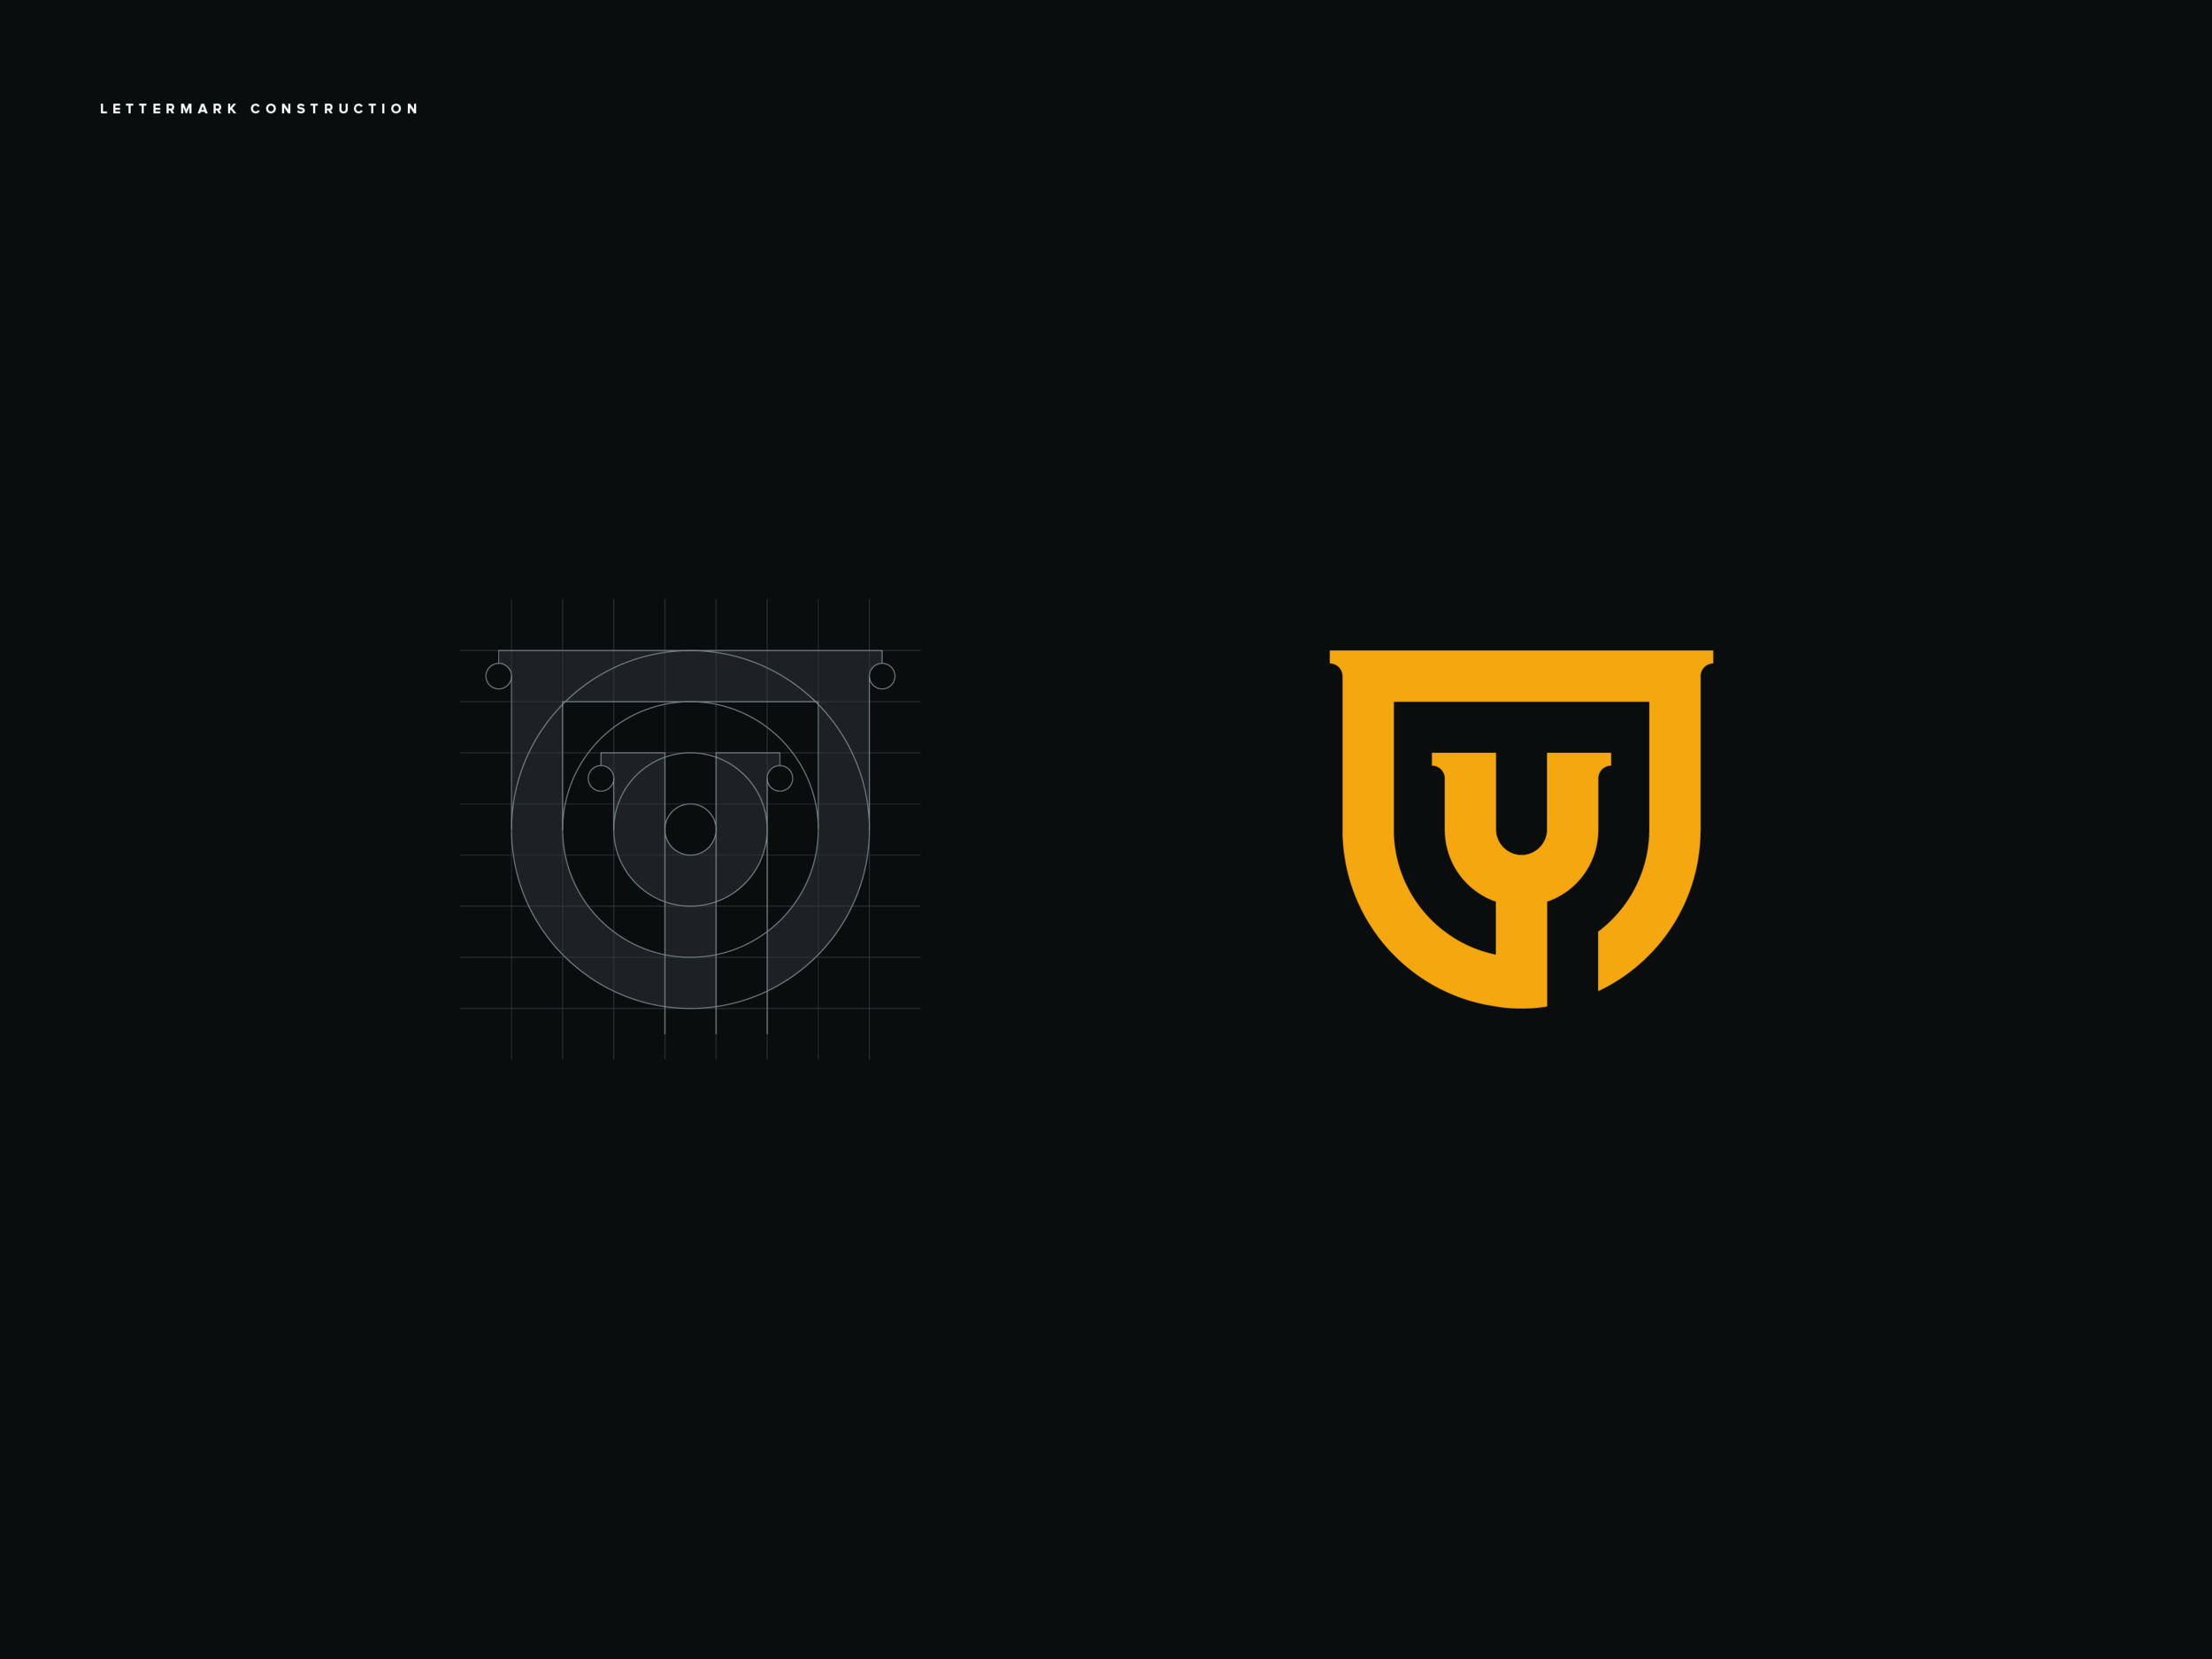 yr-lettermark.png